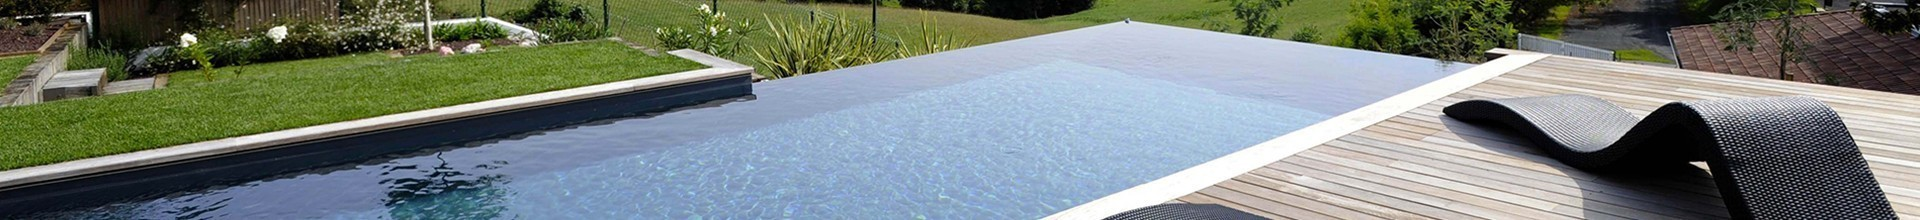 Direct usine, piscine coque prix Cote-d-Or